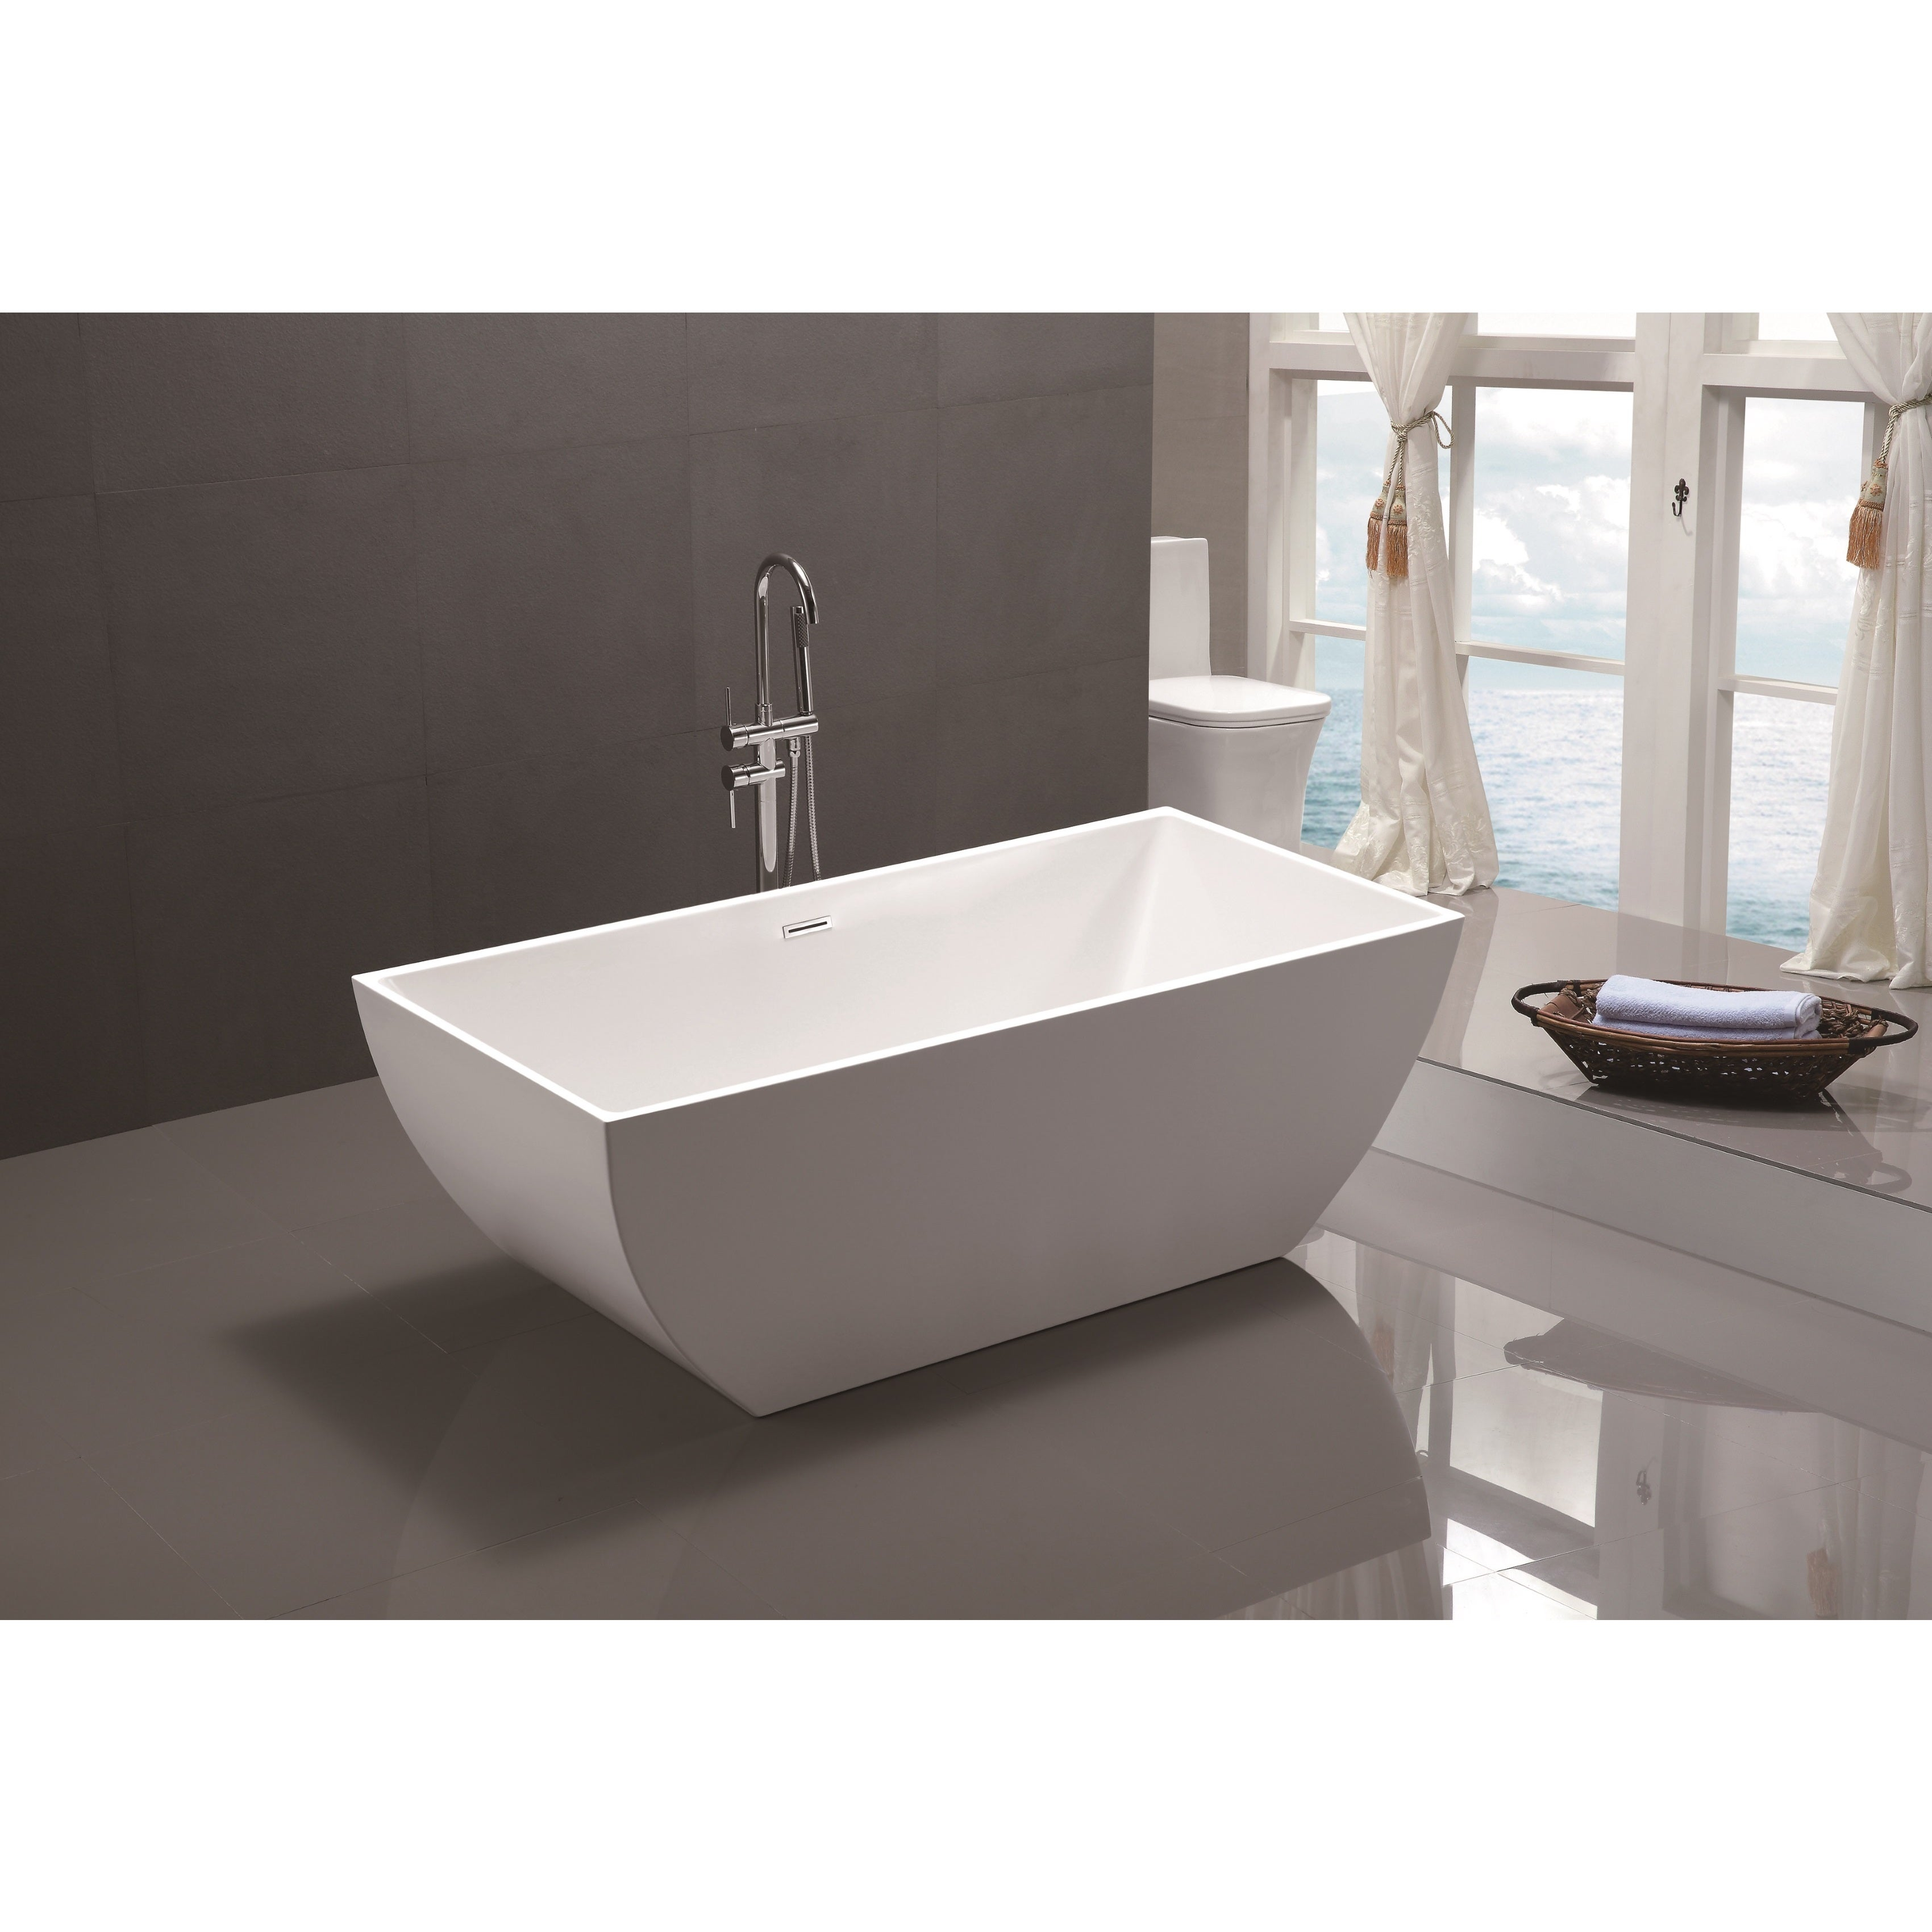 Vanity Art White Acrylic 66 5 Inch Freestanding Soaking Bathtub